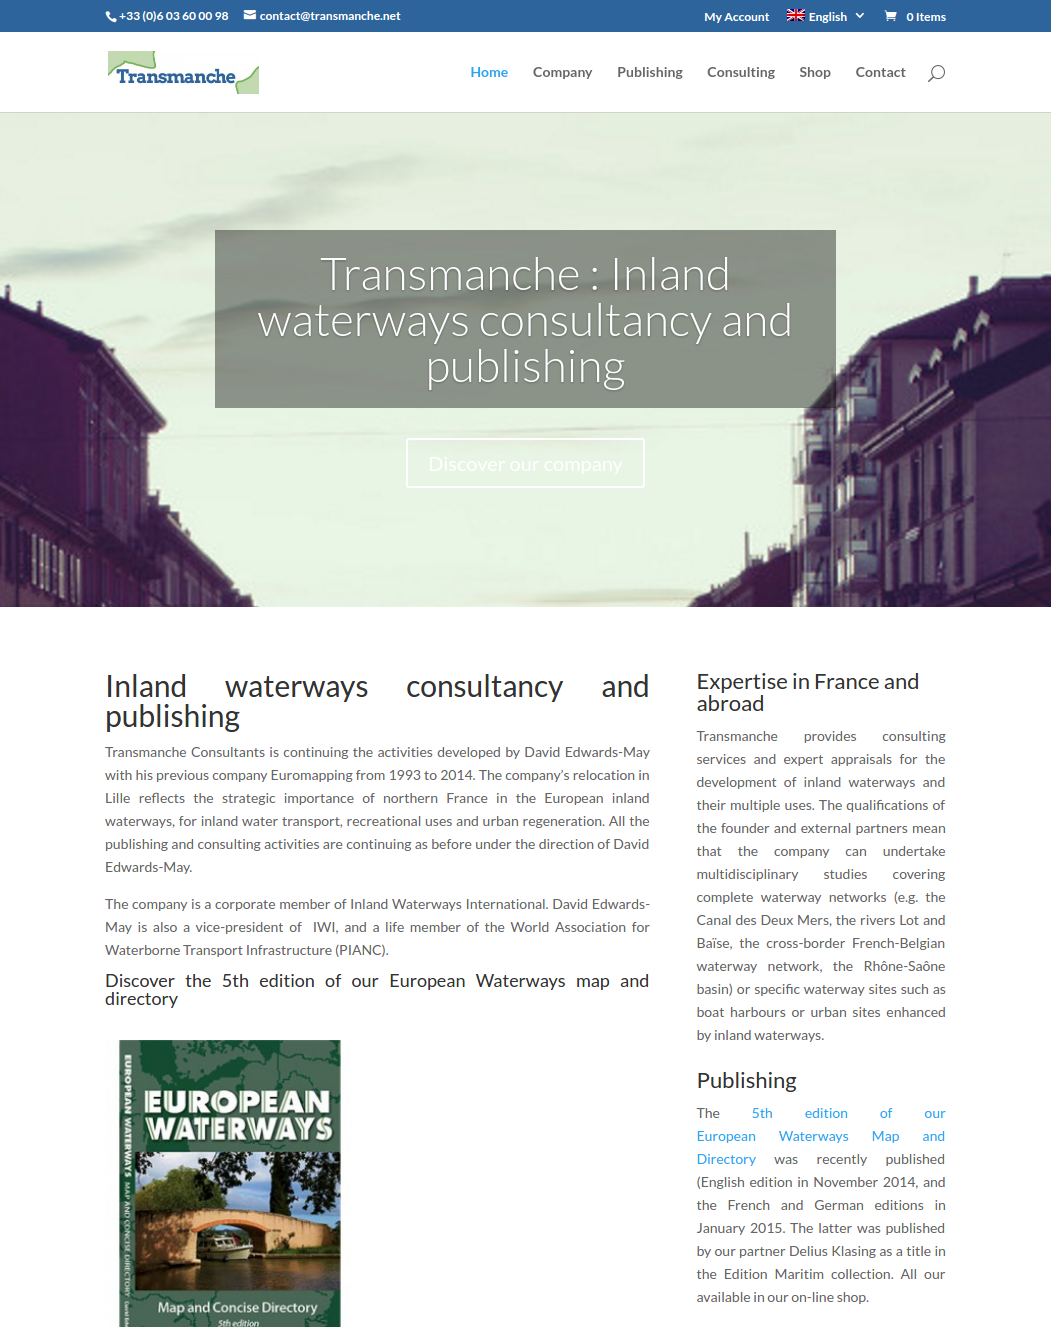 screenshot-www.transmanche.net 2016-11-22 19-57-45